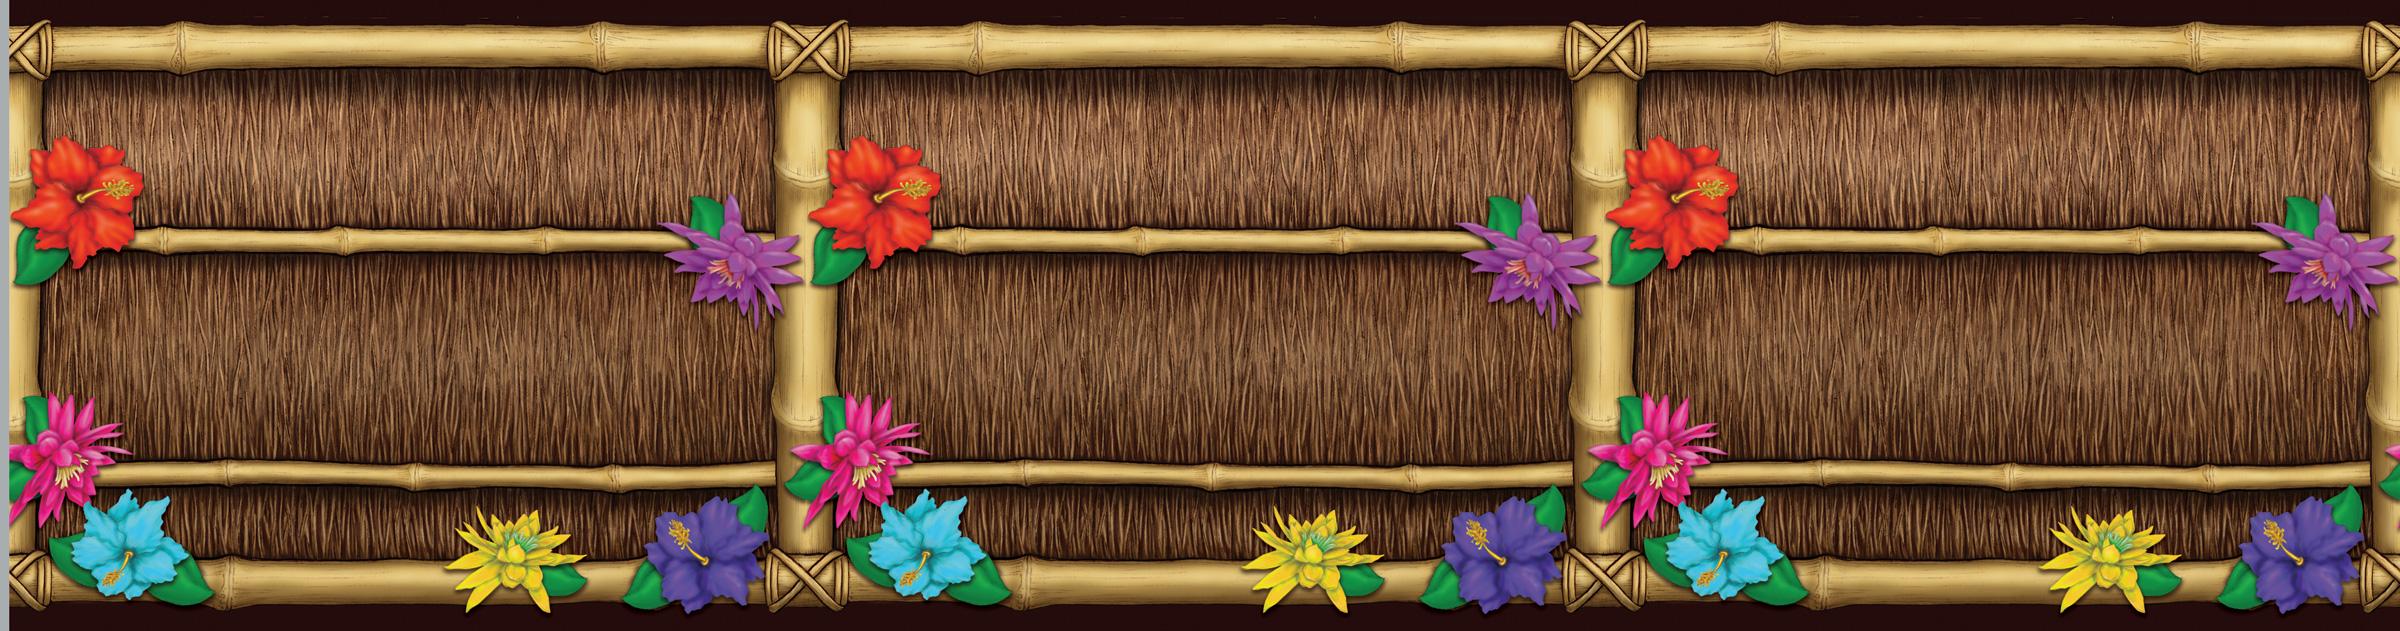 wand deko hawaii partydeko und g nstige faschingskost me vegaoo. Black Bedroom Furniture Sets. Home Design Ideas